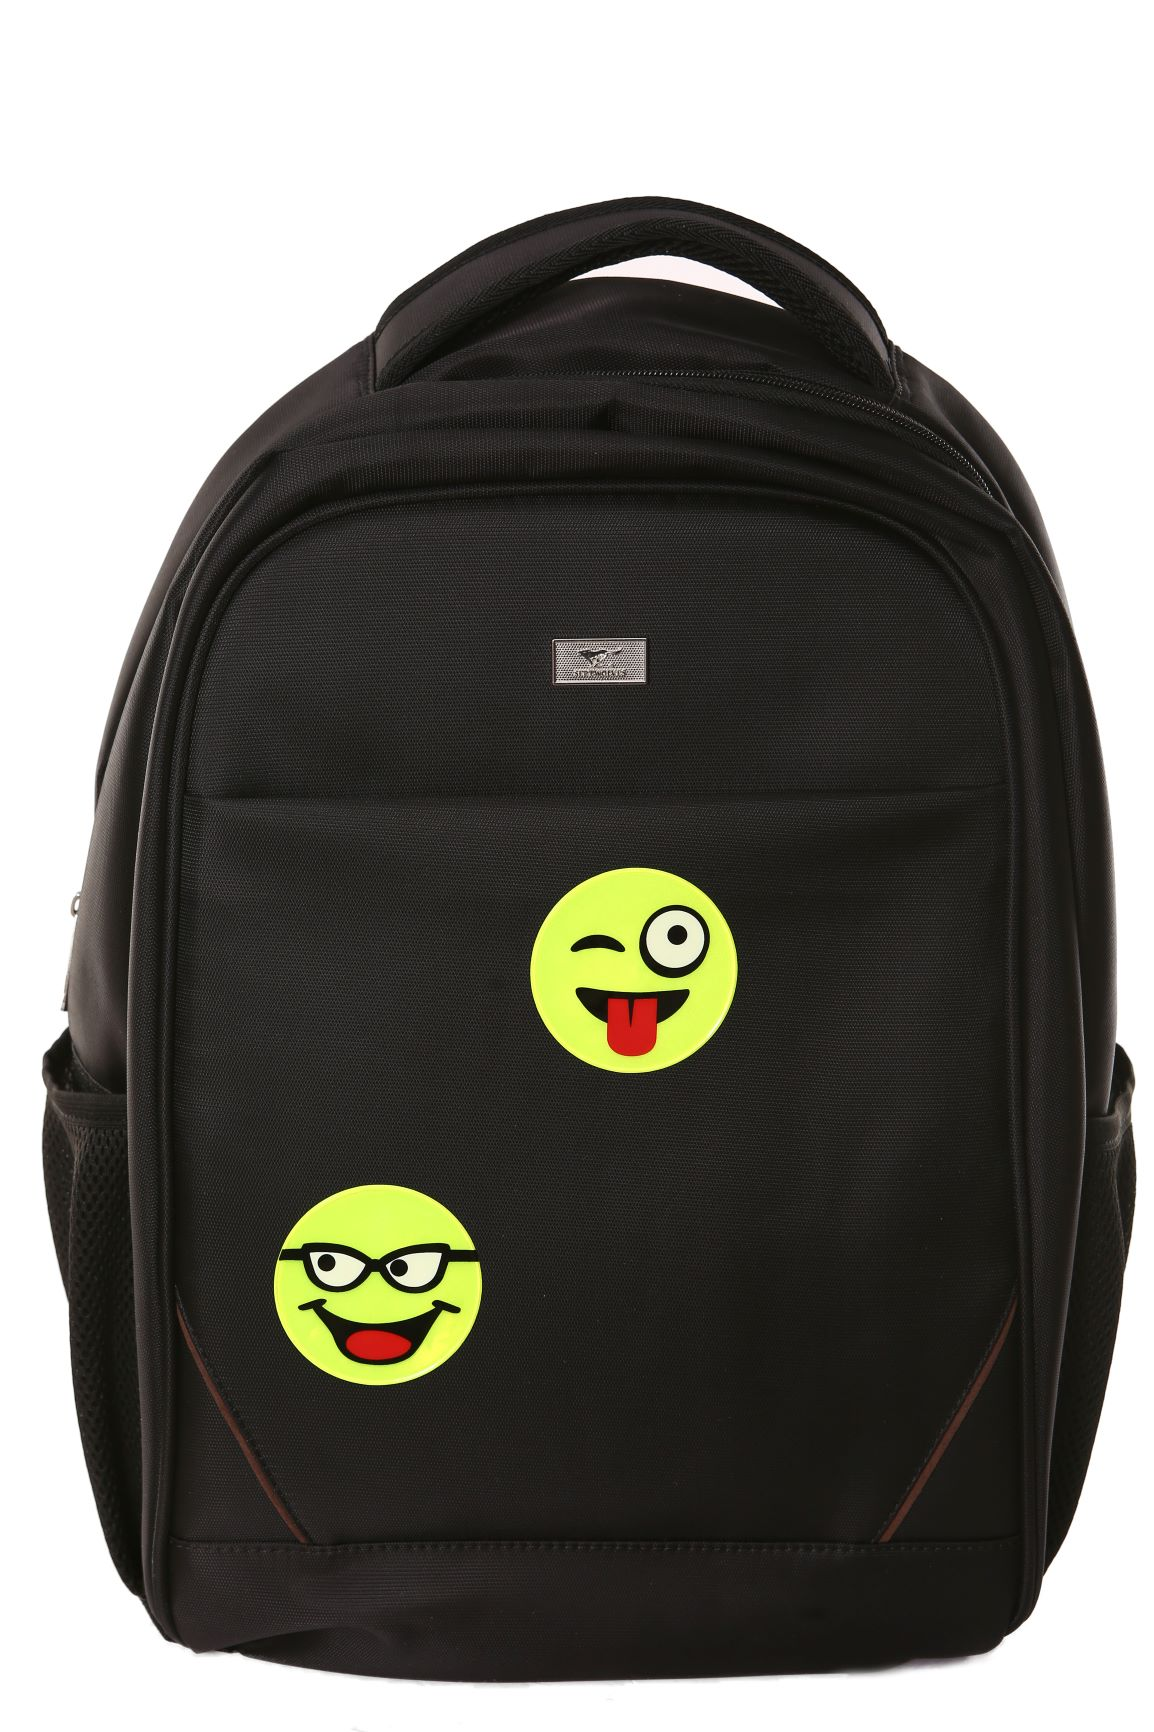 reflective sticker for bag